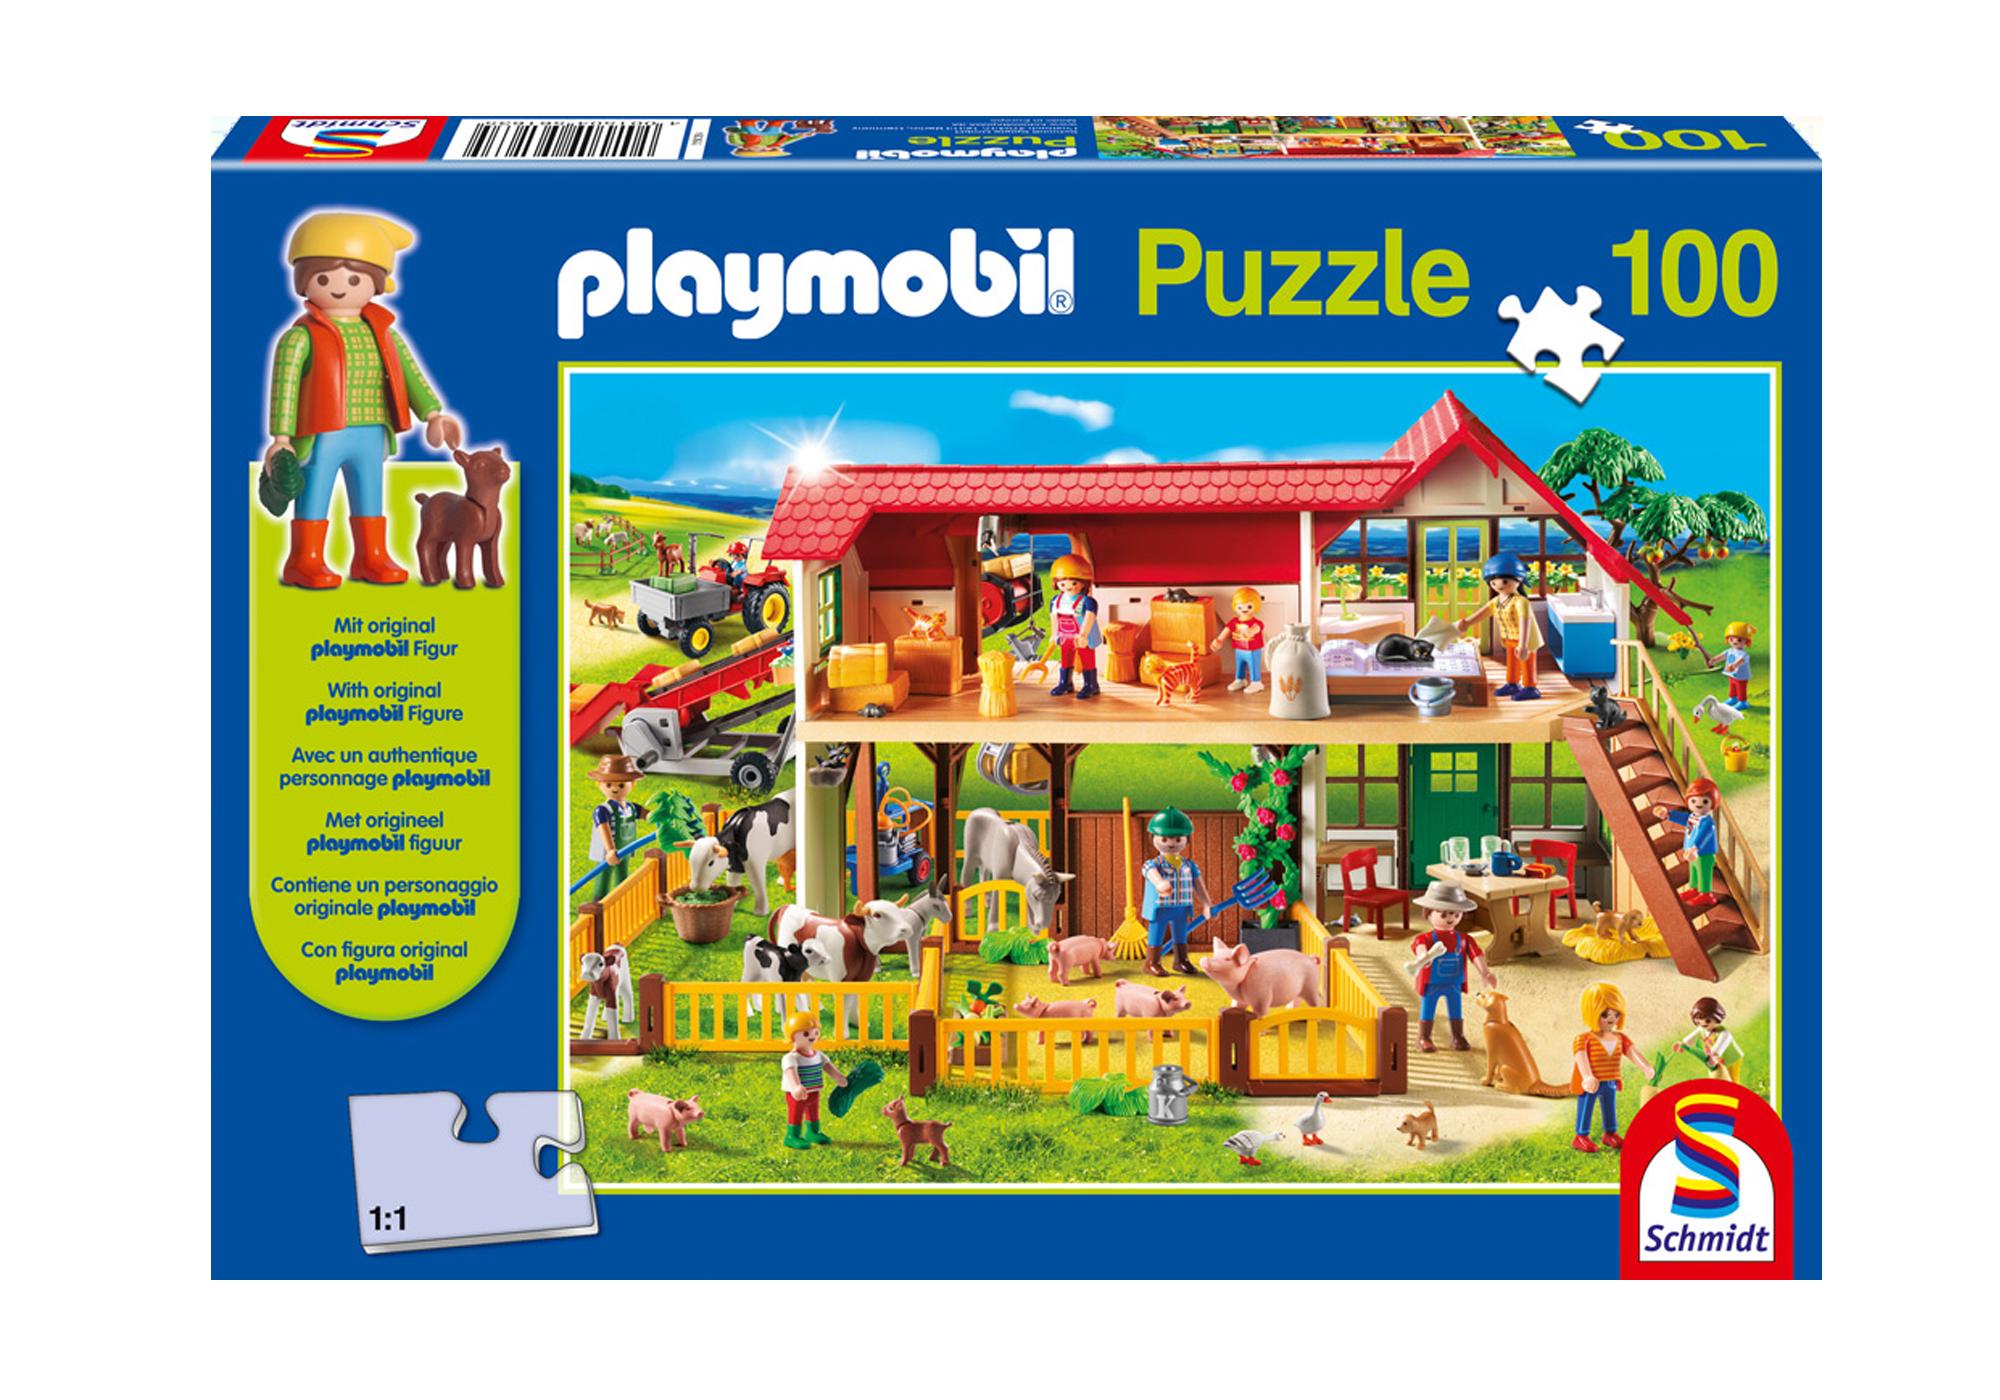 http://media.playmobil.com/i/playmobil/80011_product_detail/Puzzle - Bauernhof